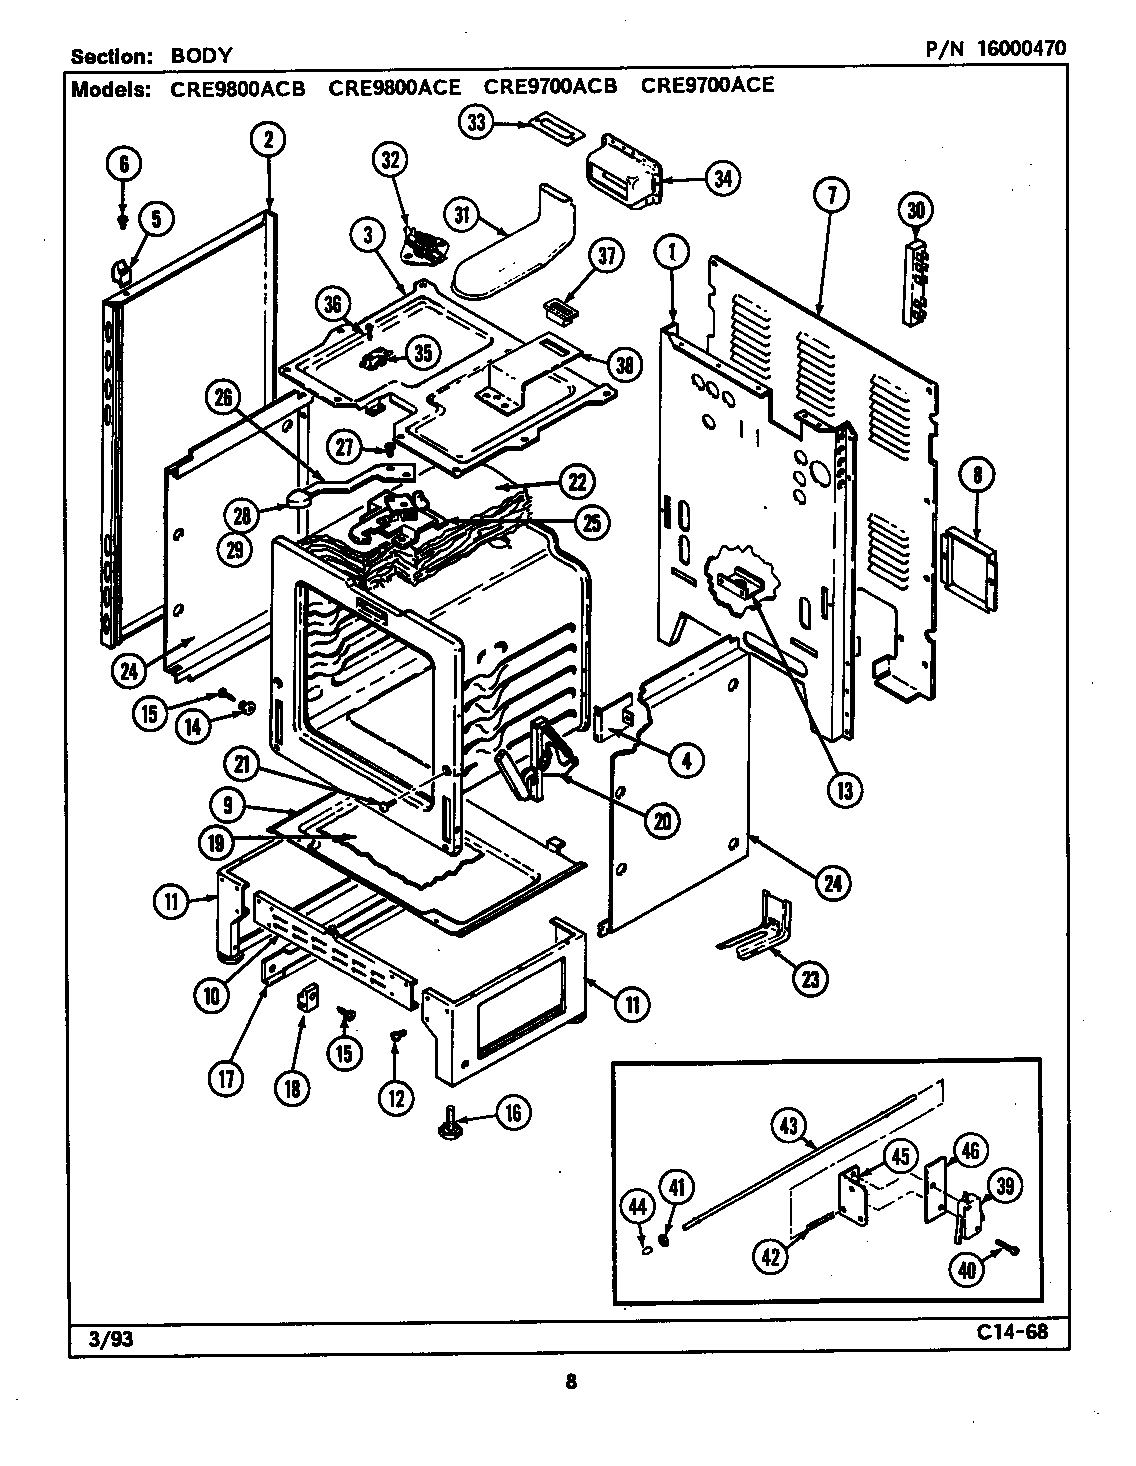 Maytag Washer Temperature Sensor Wiring Diagram - Automotive Wiring on